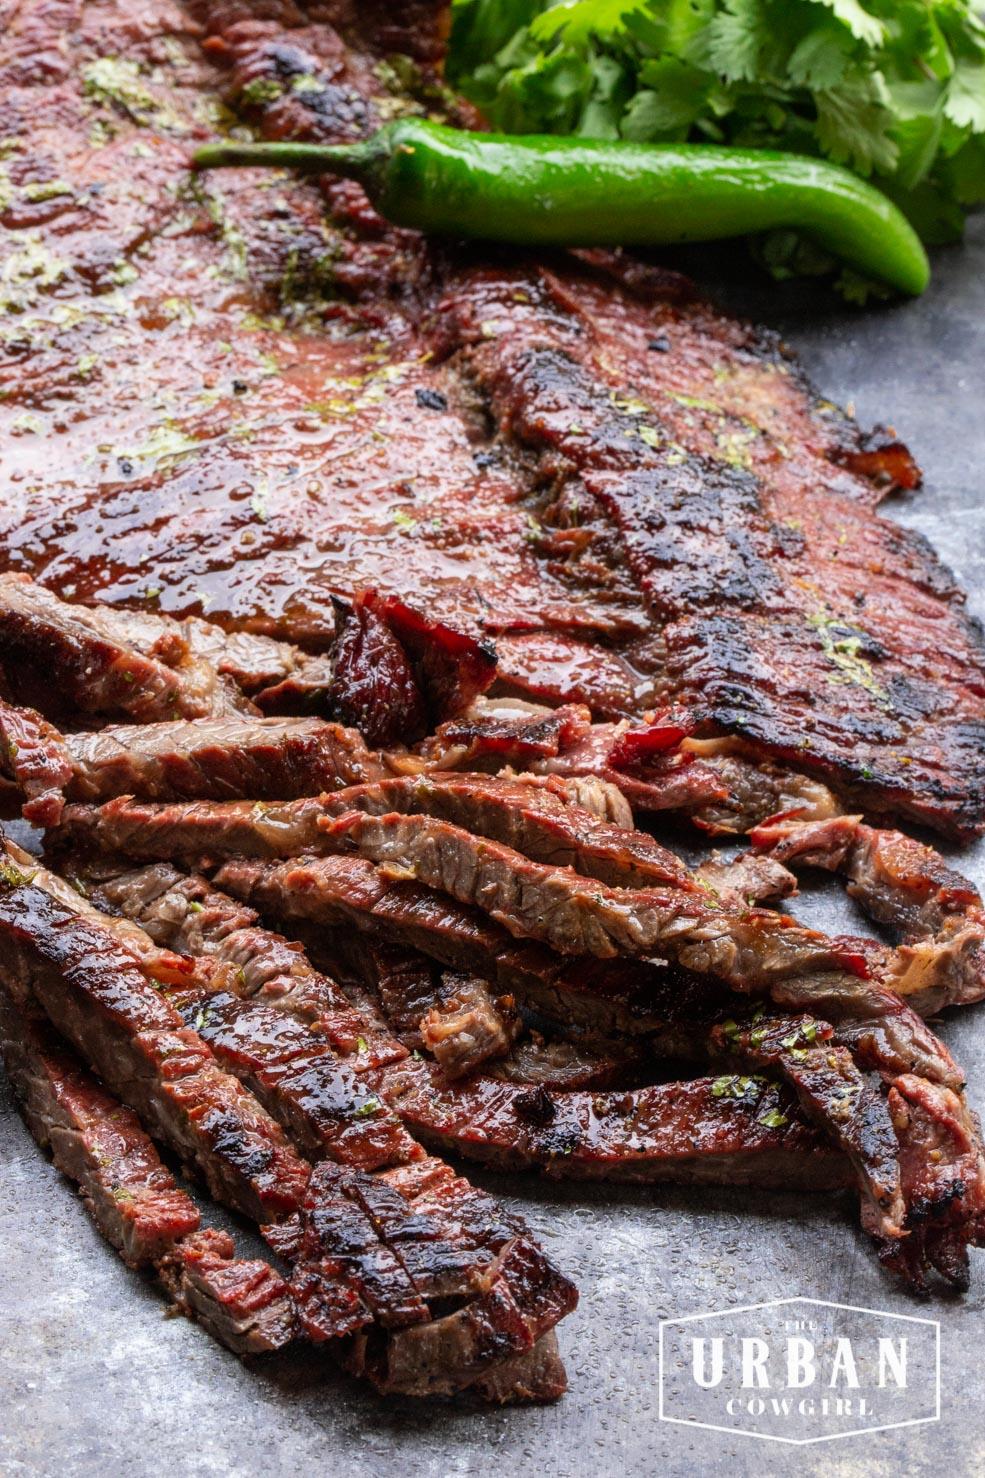 Chef Sarah S Famous Recipe For Tex Mex Style Steak Fajita Marinade Will Take Your Homemade Steak Fajita Beef Fajita Recipe Steak Fajita Marinade Fajita Recipe